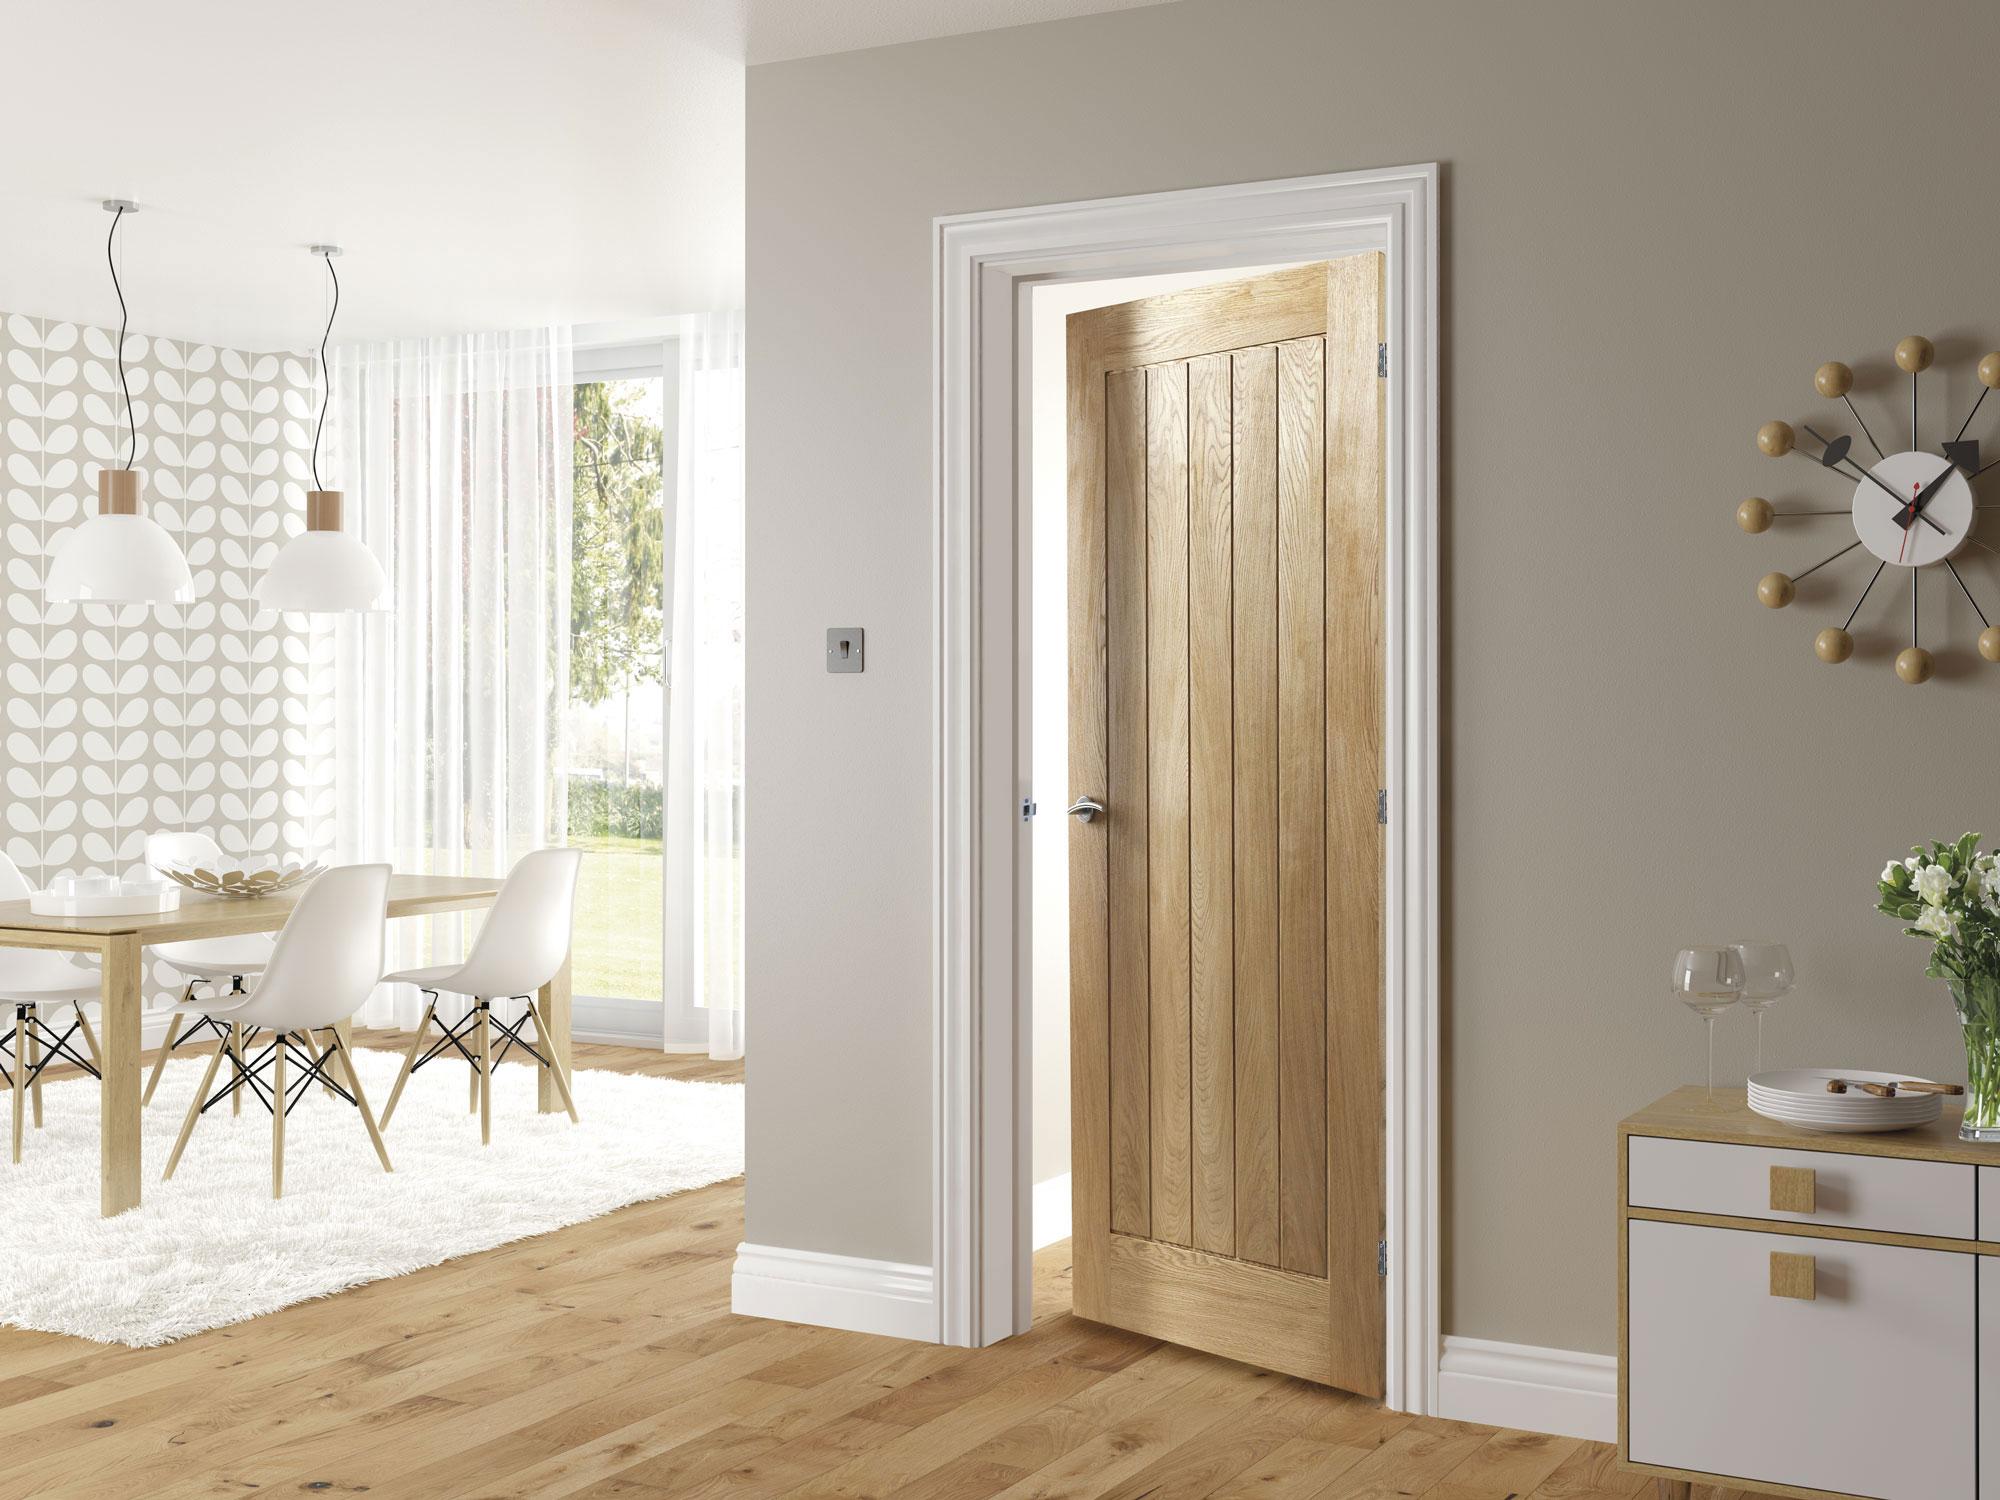 oak 4 panel internal door. Black Bedroom Furniture Sets. Home Design Ideas